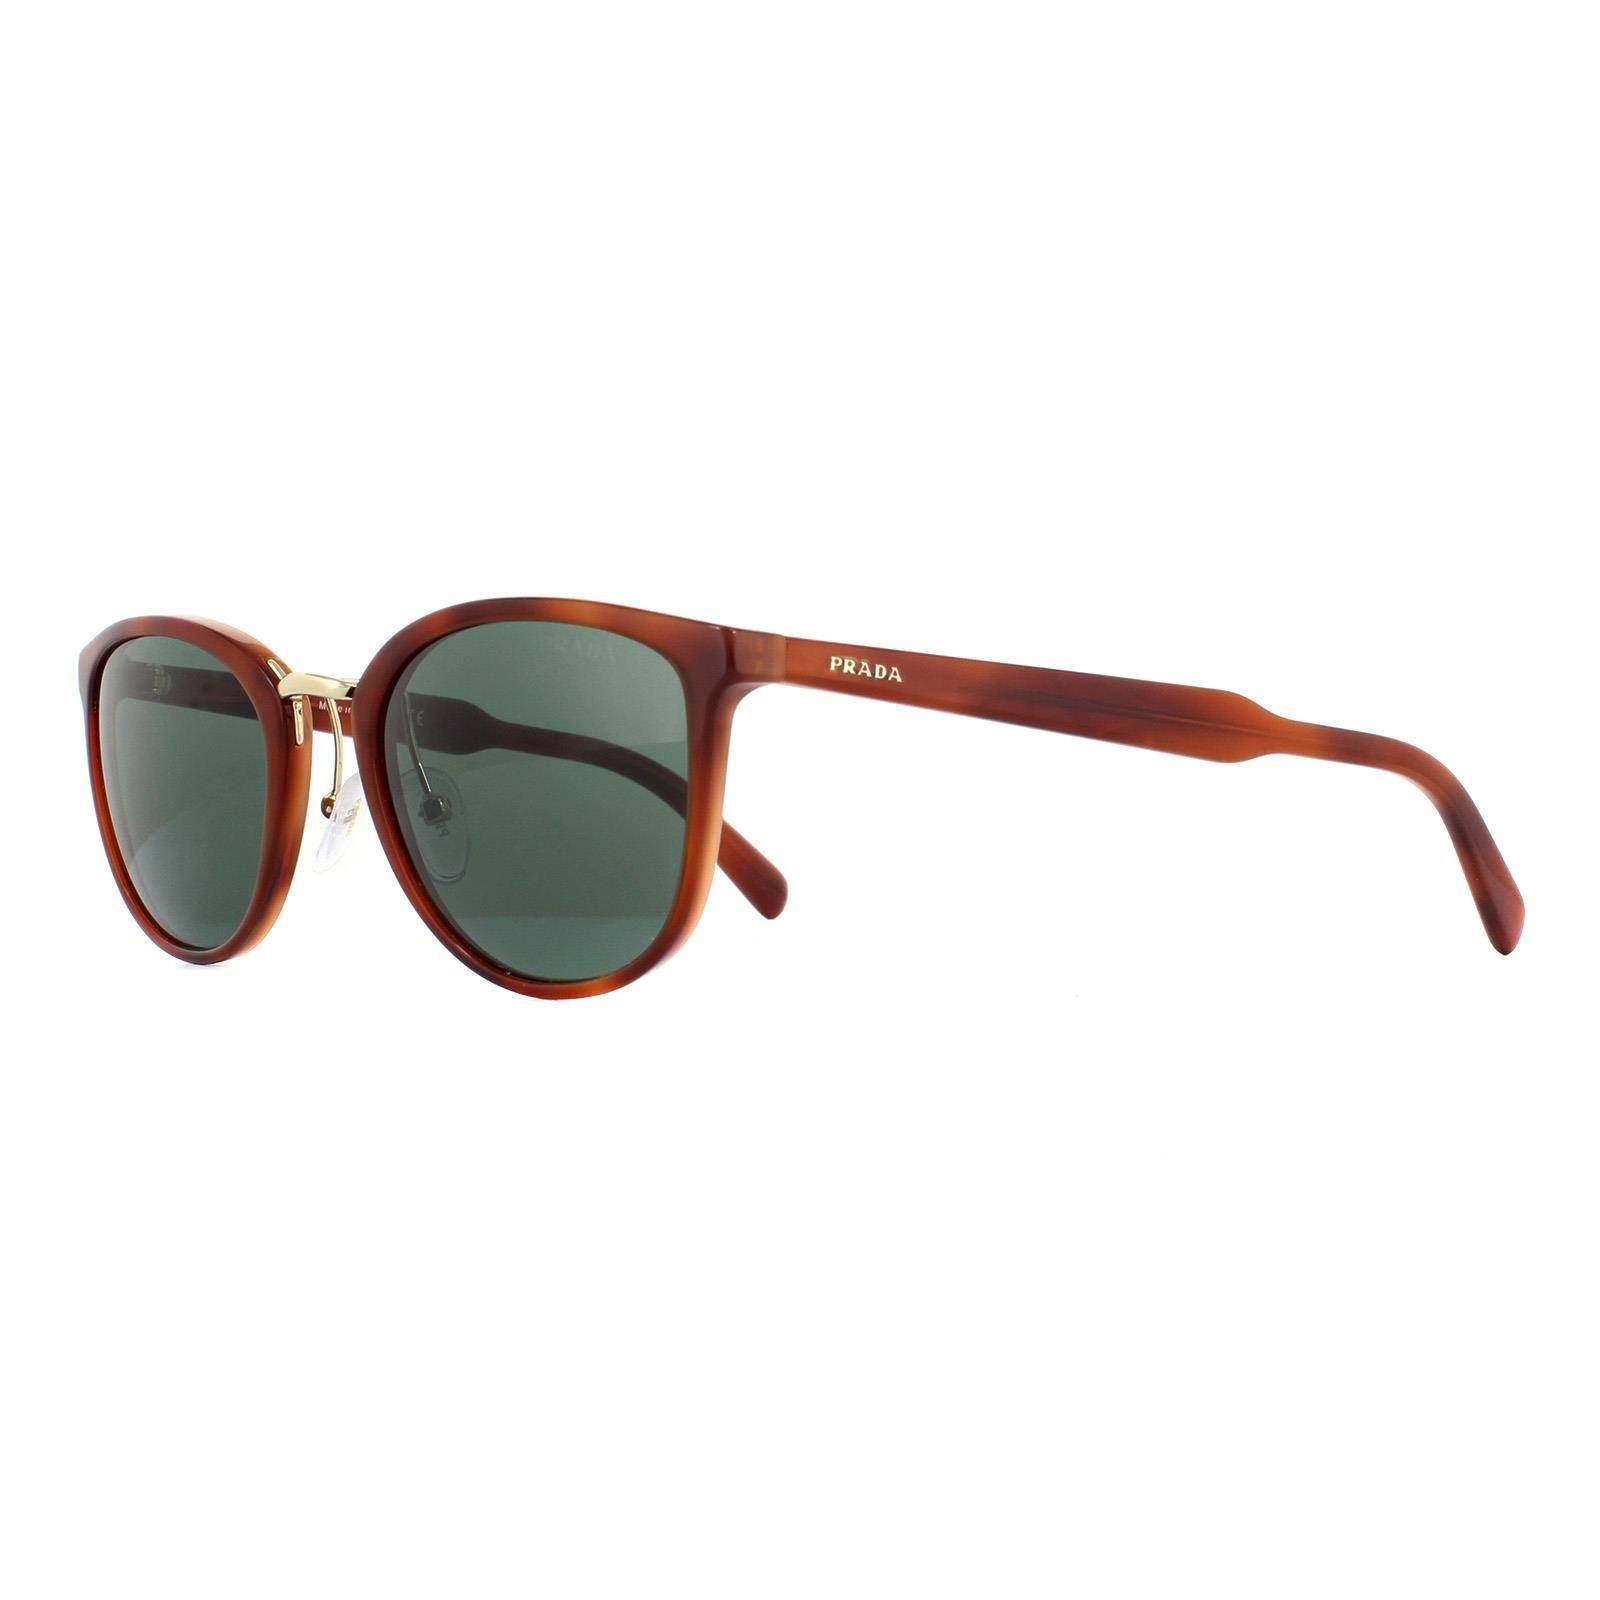 Prada Sunglasses 22SS USE3O1 Striped Light Brown Green